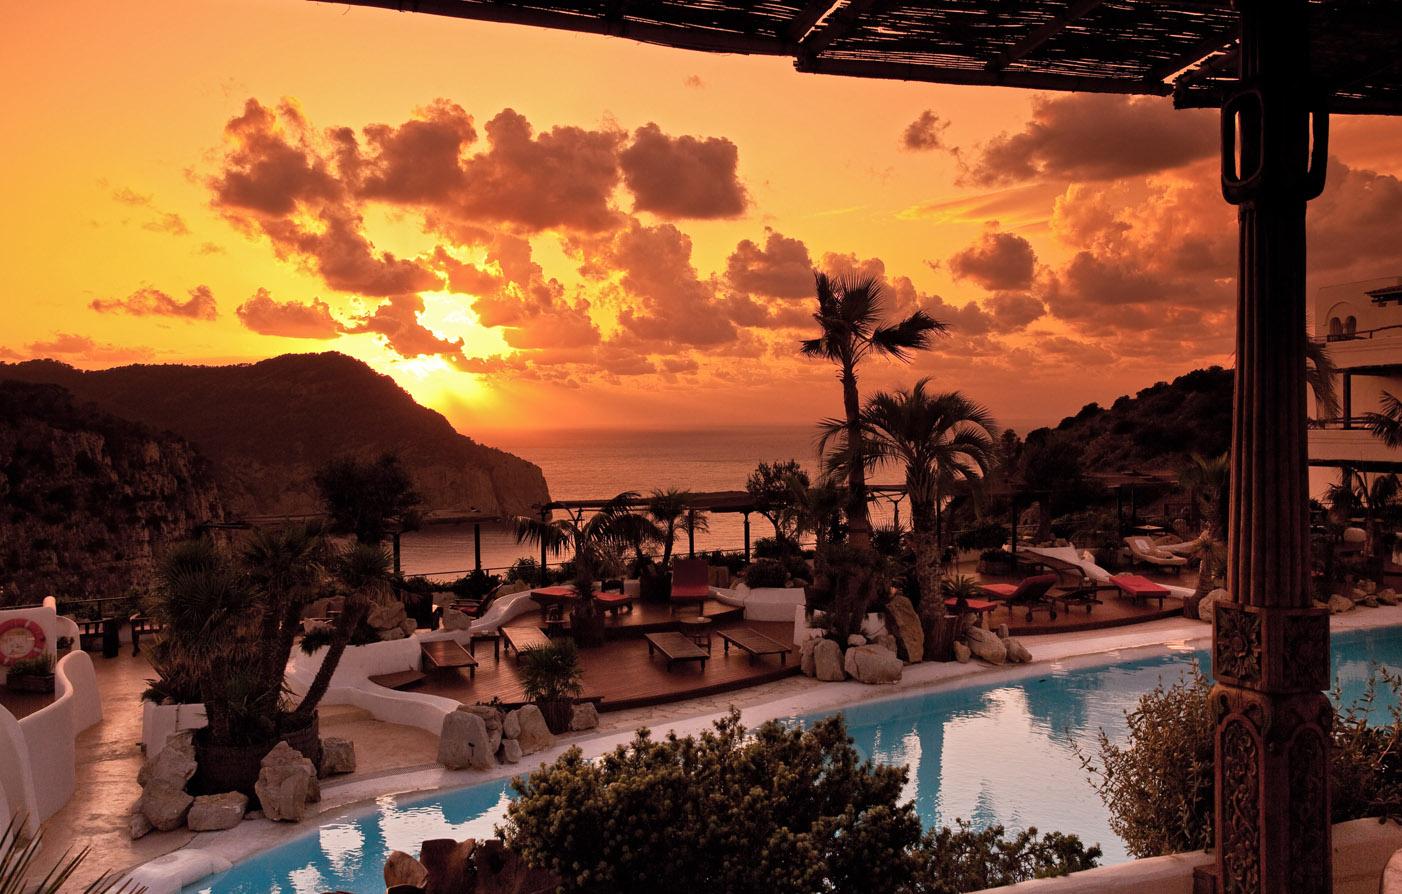 Hotel hacienda na xamena ibiza five star hotel for Ibiza hotel luxury 5 star